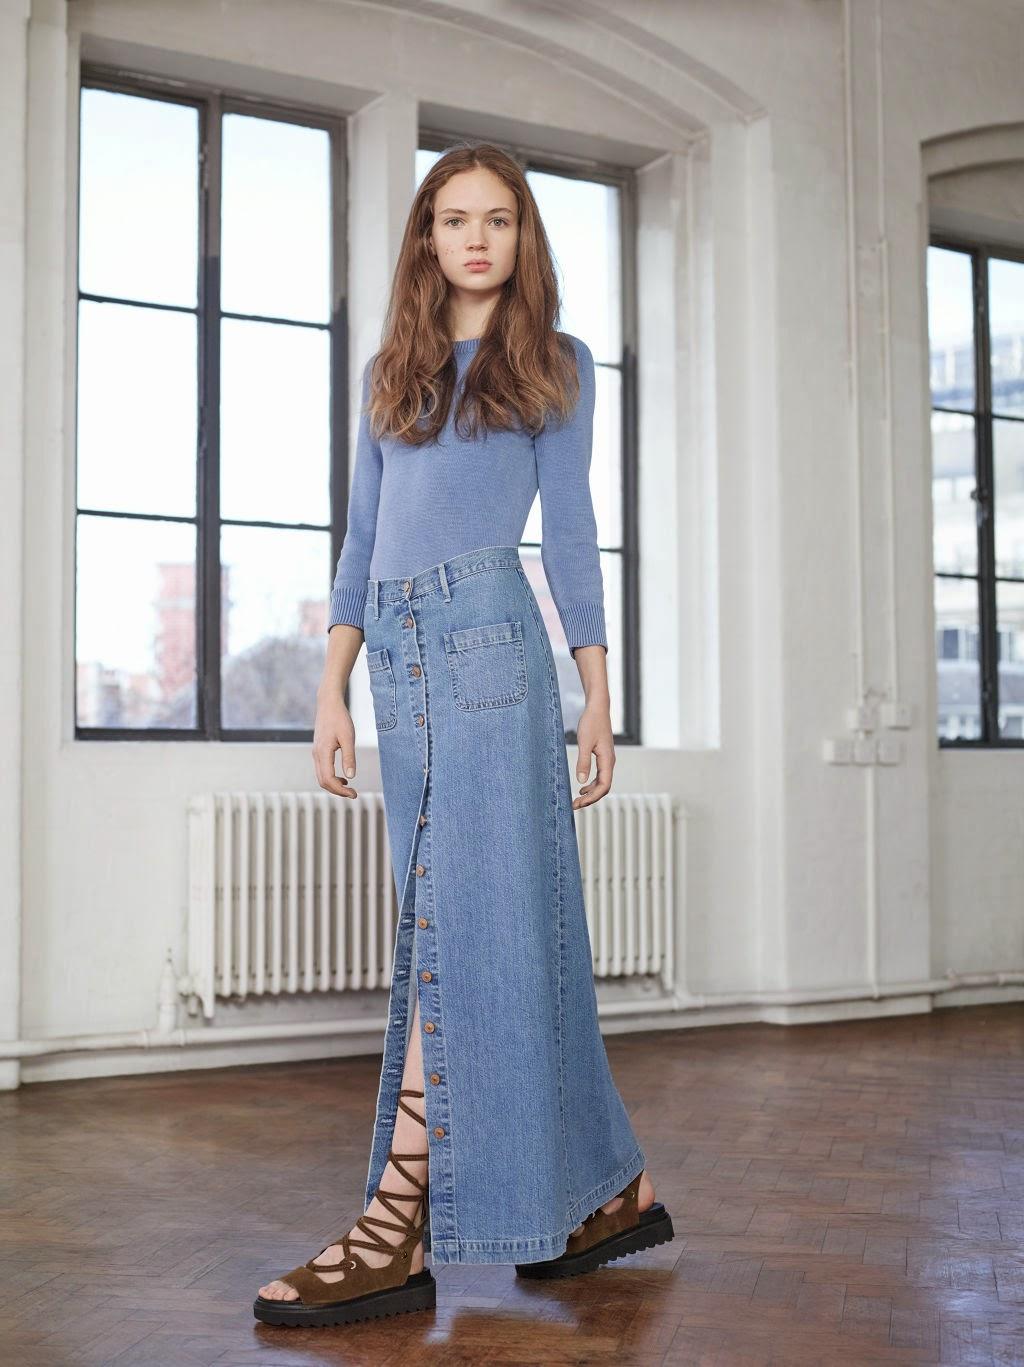 Trafaluc, Zara, SS15, influencia 70', Blog de Moda, Mis elegidos, Looks, Cool, Que me pongo?, Tendencias, I Love, Amazing